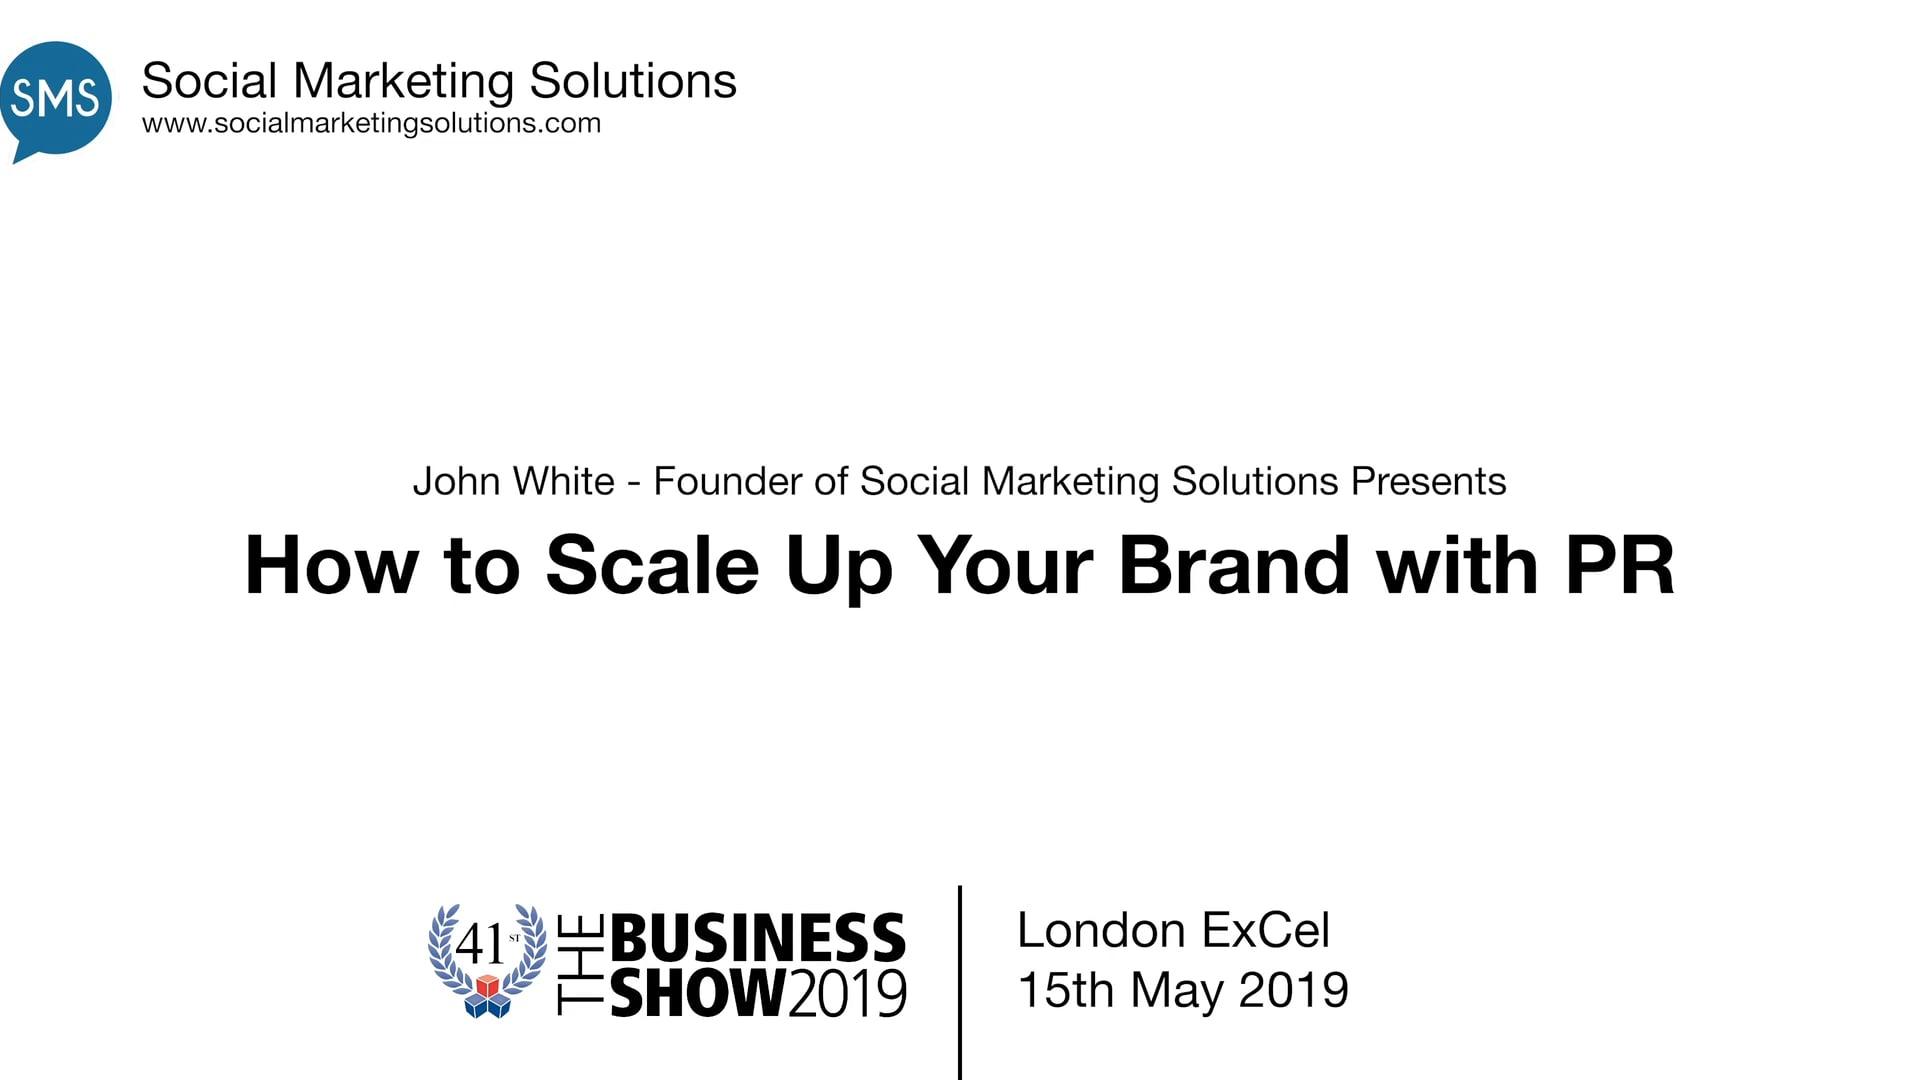 John White Business Show Speech 21.5.19